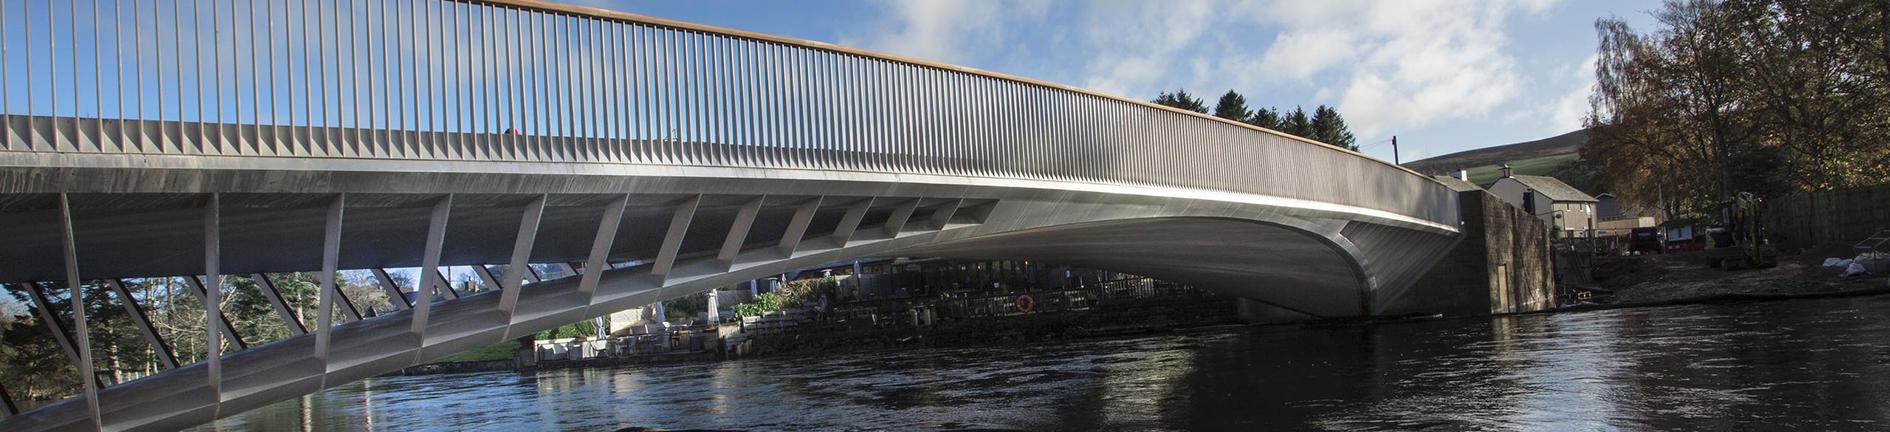 Pooley Bridge made of Outokumpu stainless steel